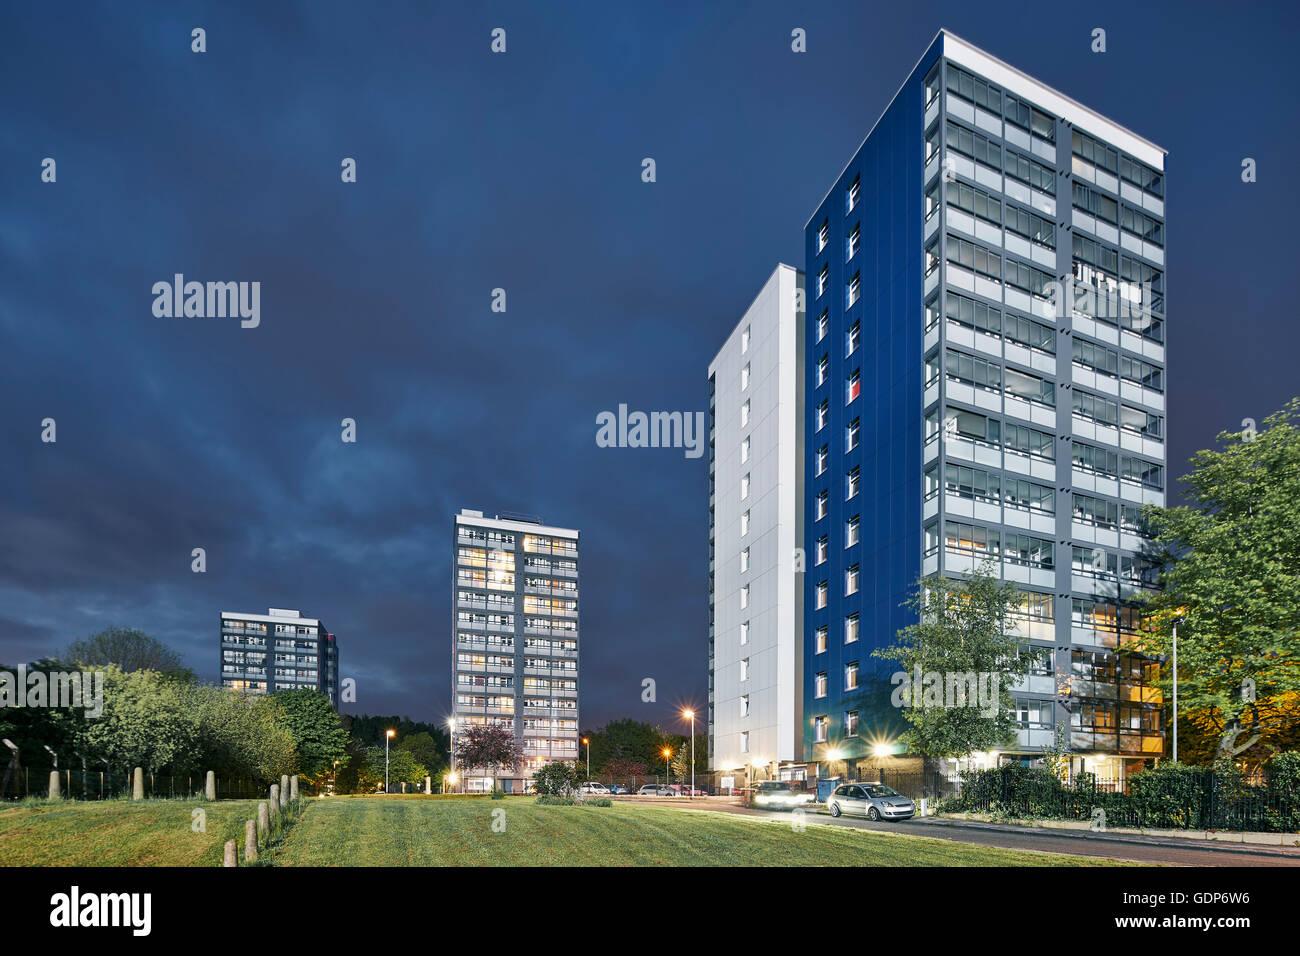 Three urban public housing apartment blocks at night - Stock Image